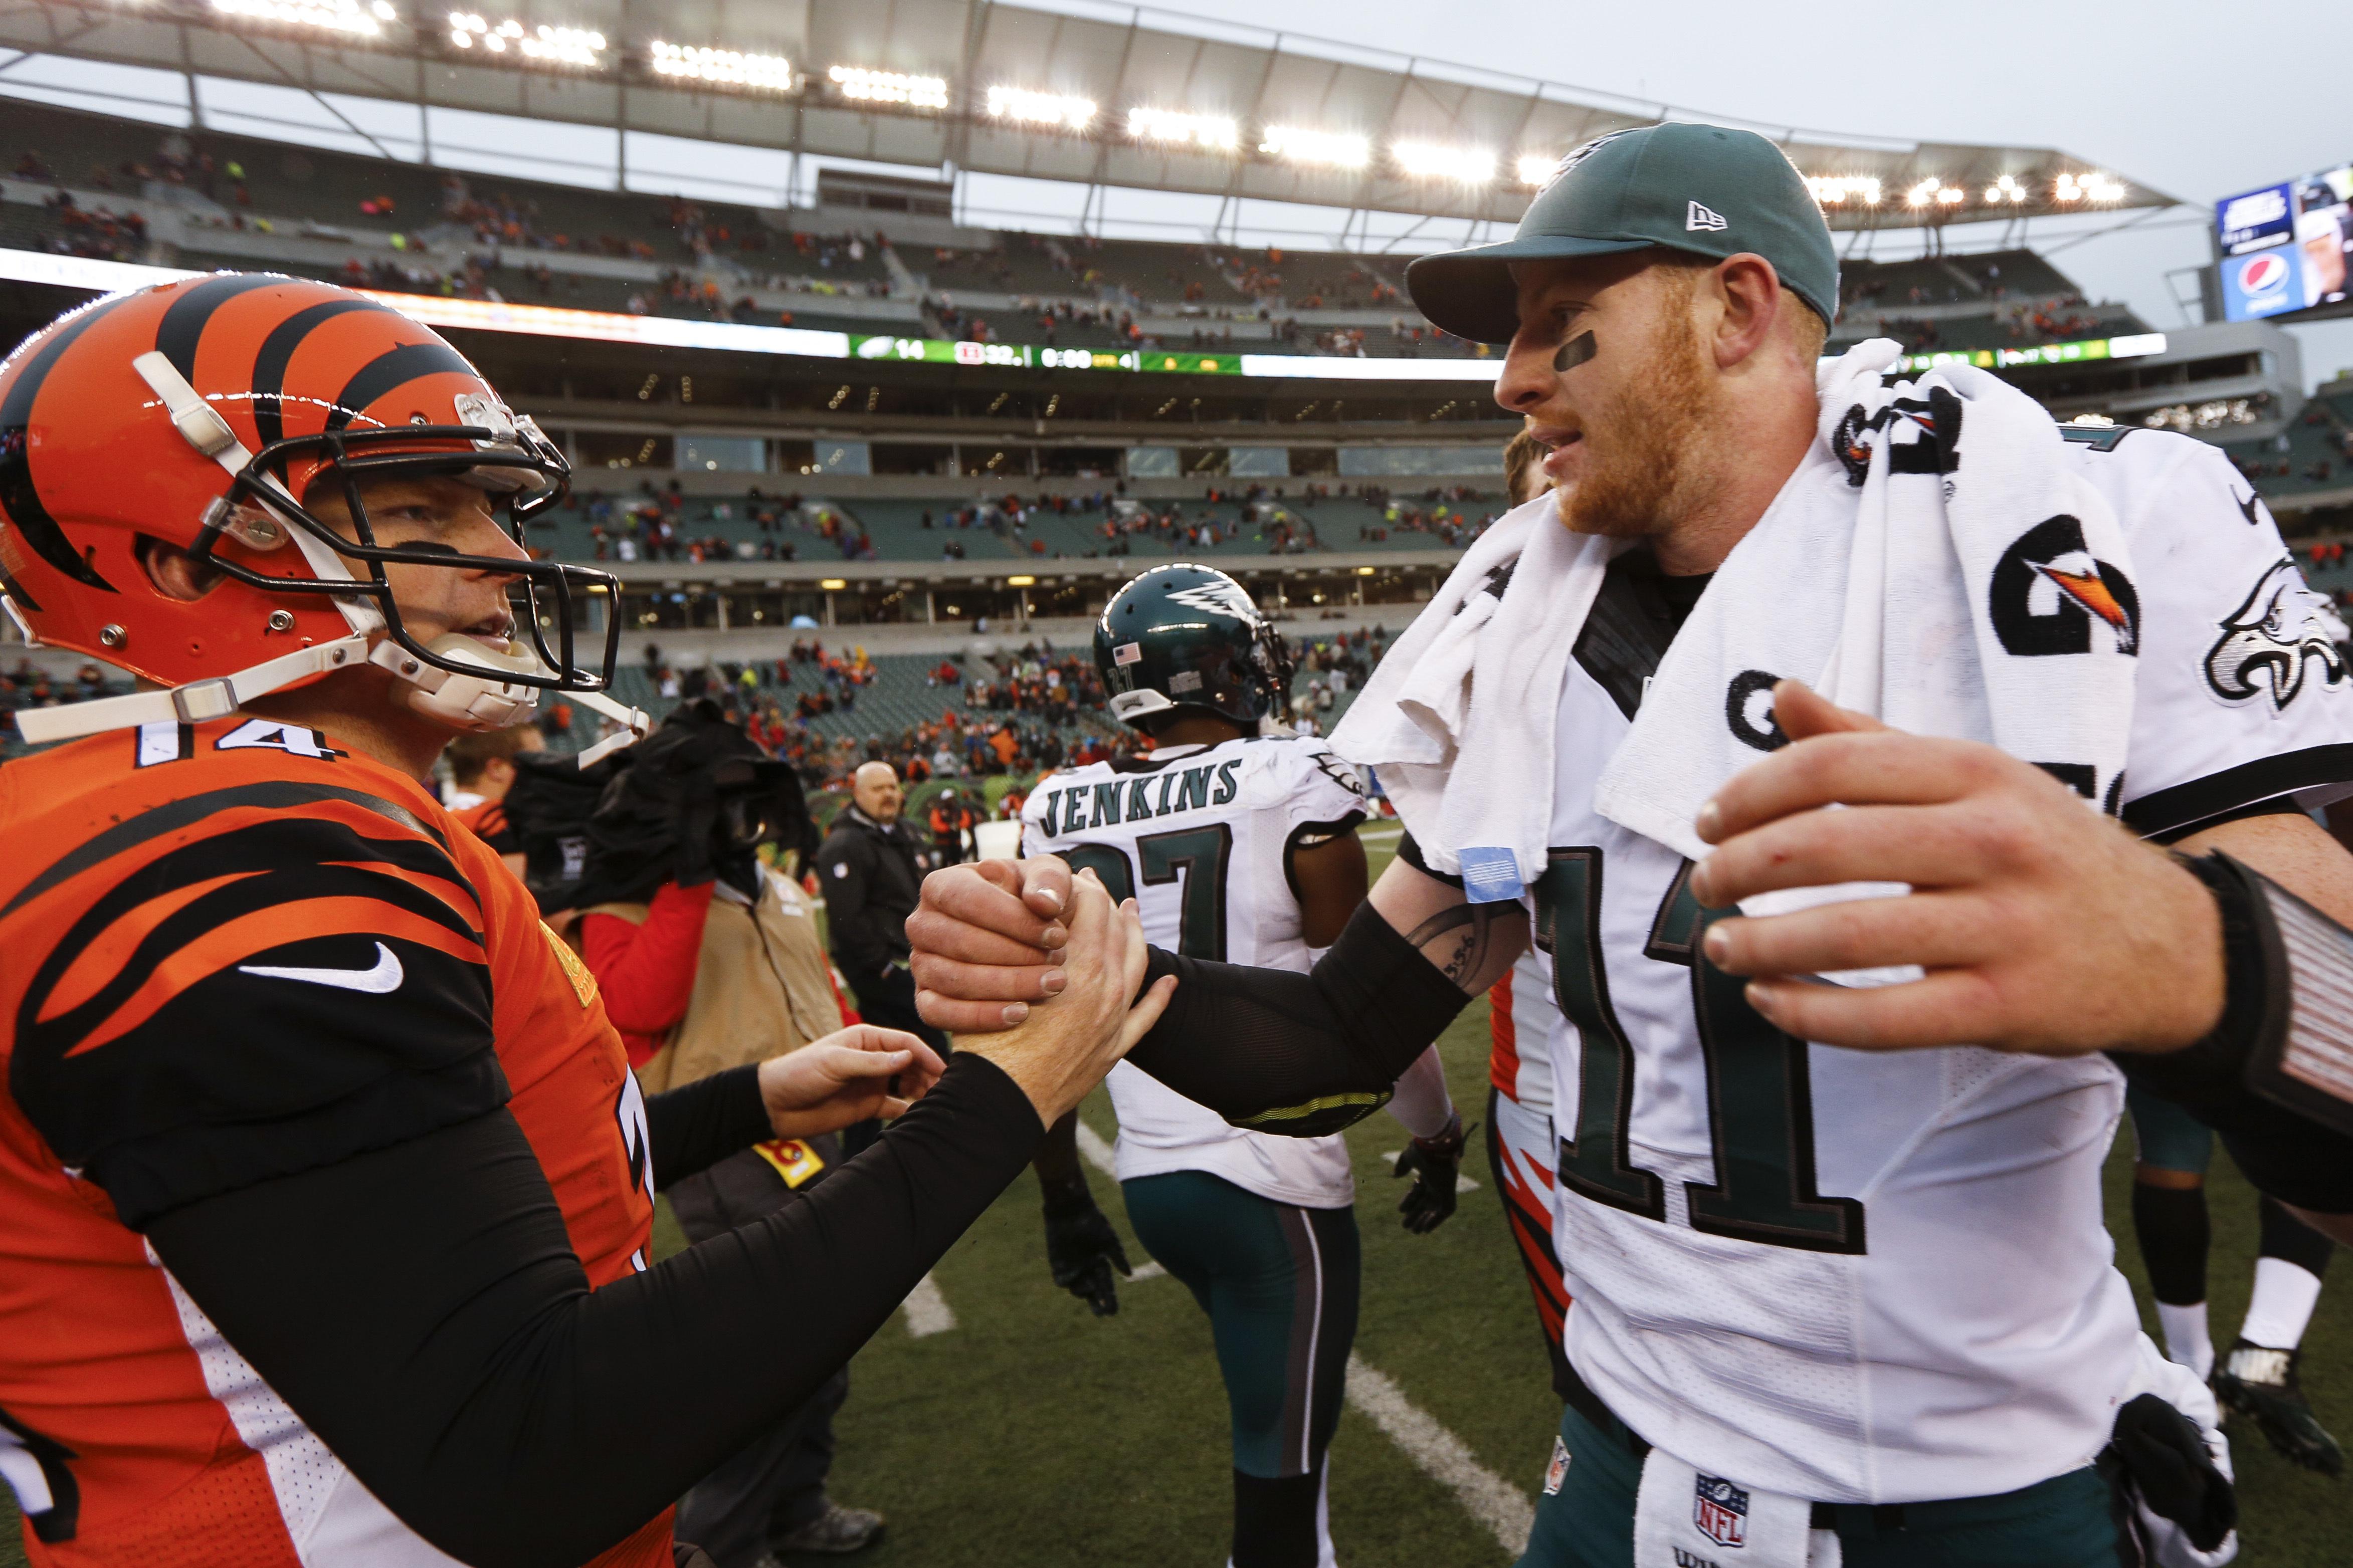 Cincinnati Bengals quarterback Andy Dalton (14) and Philadelphia Eagles quarterback Carson Wentz (11) meet on the field after an NFL football game, Sunday, Dec. 4, 2016, in Cincinnati. (AP Photo/Frank Victores)